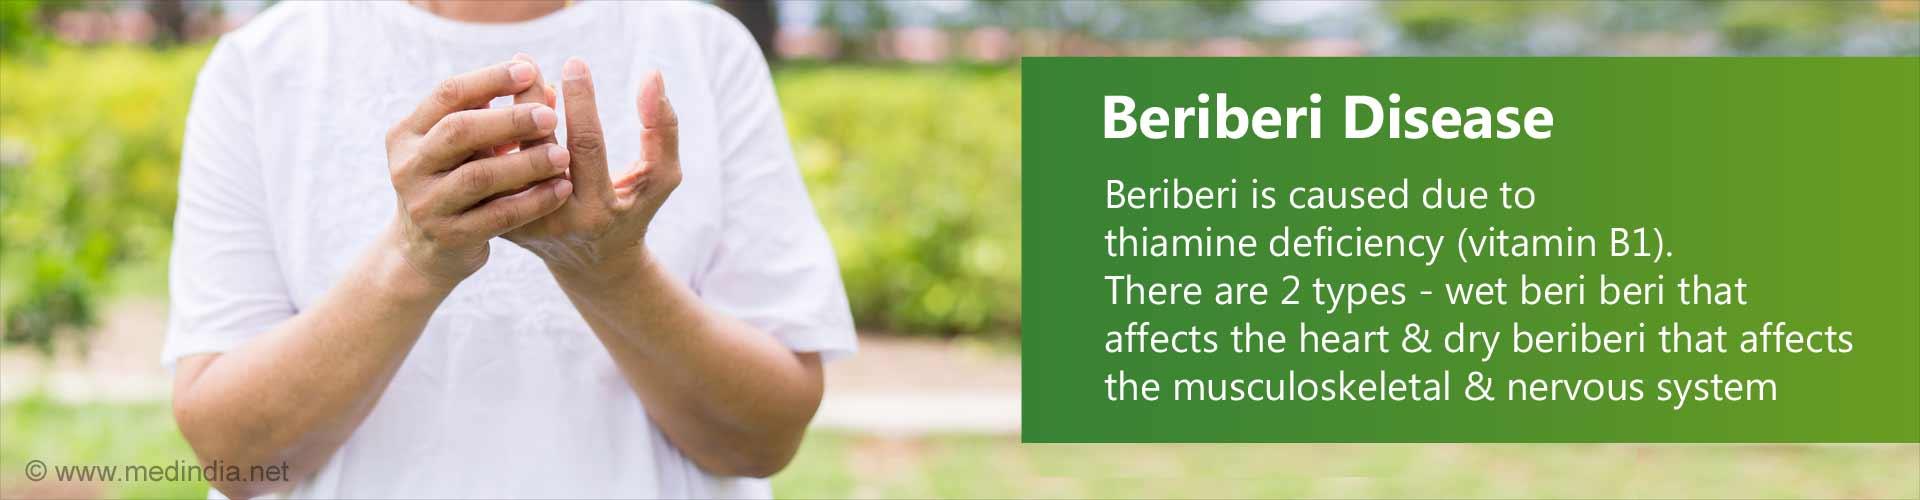 Beriberi Disease